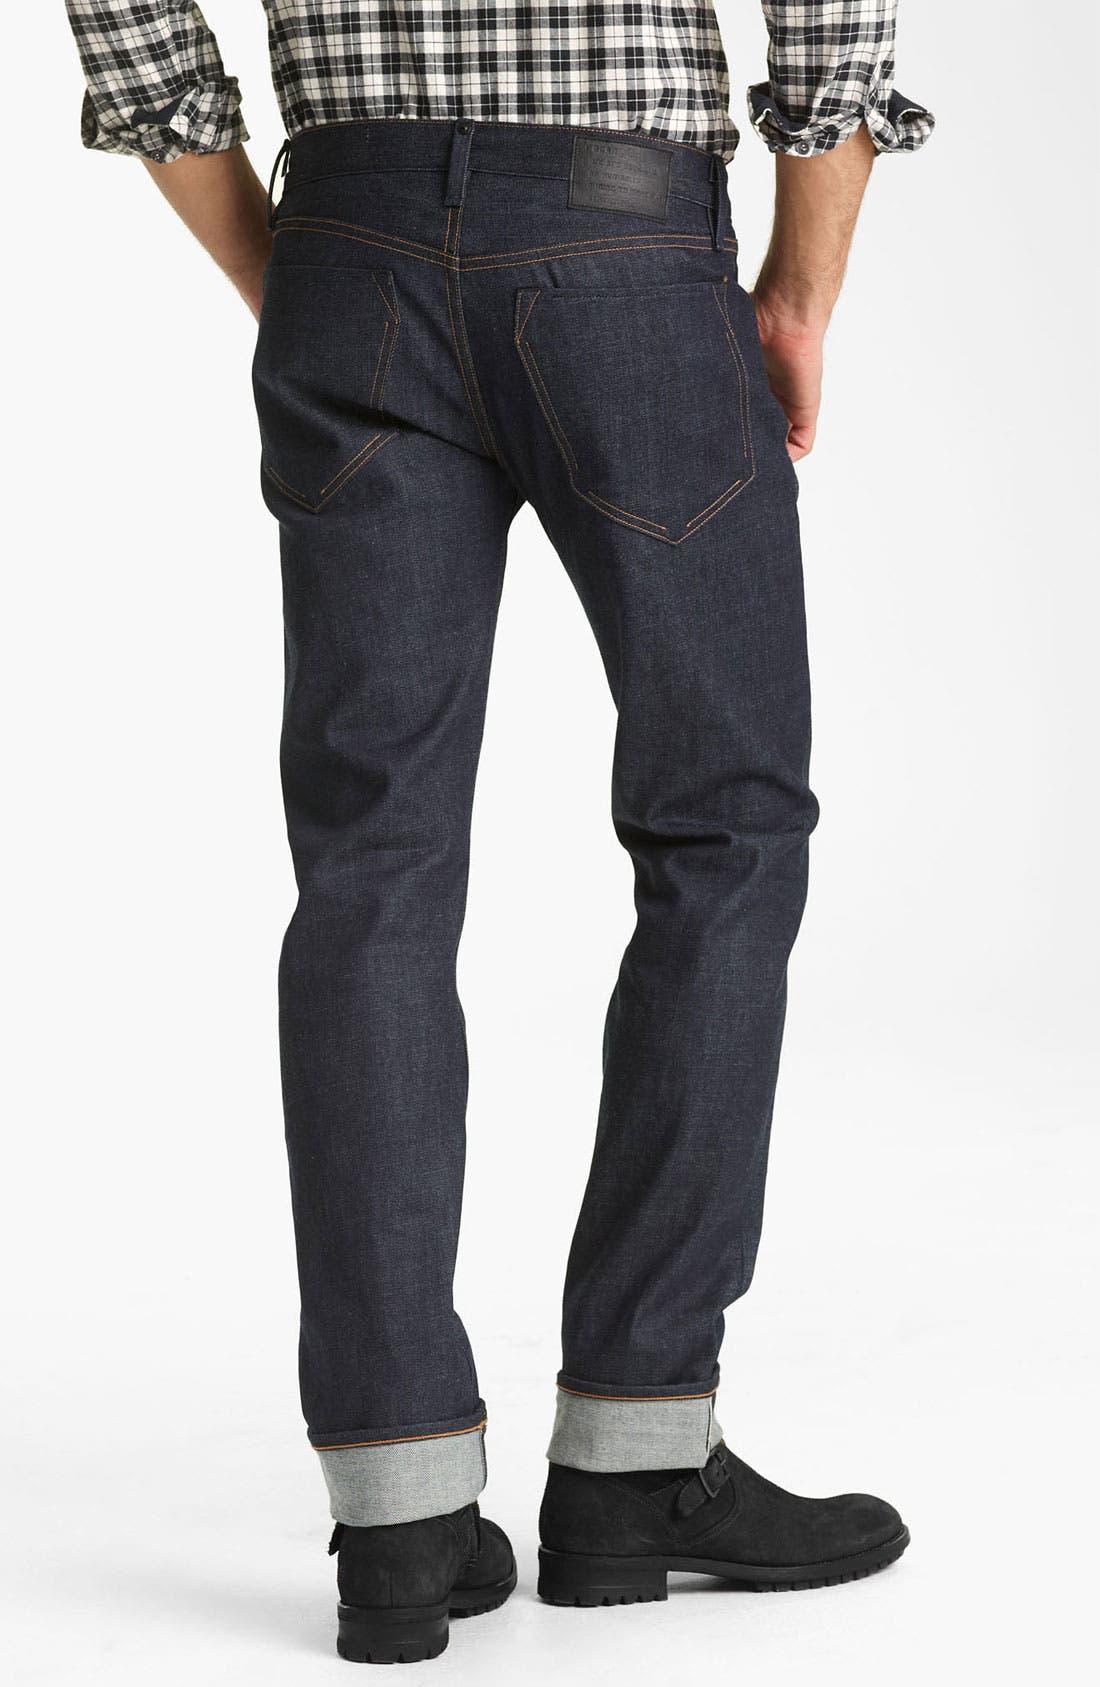 Alternate Image 1 Selected - Rogan 'Puck' Slim Straight Leg Selvedge Denim Jeans (Indigo)